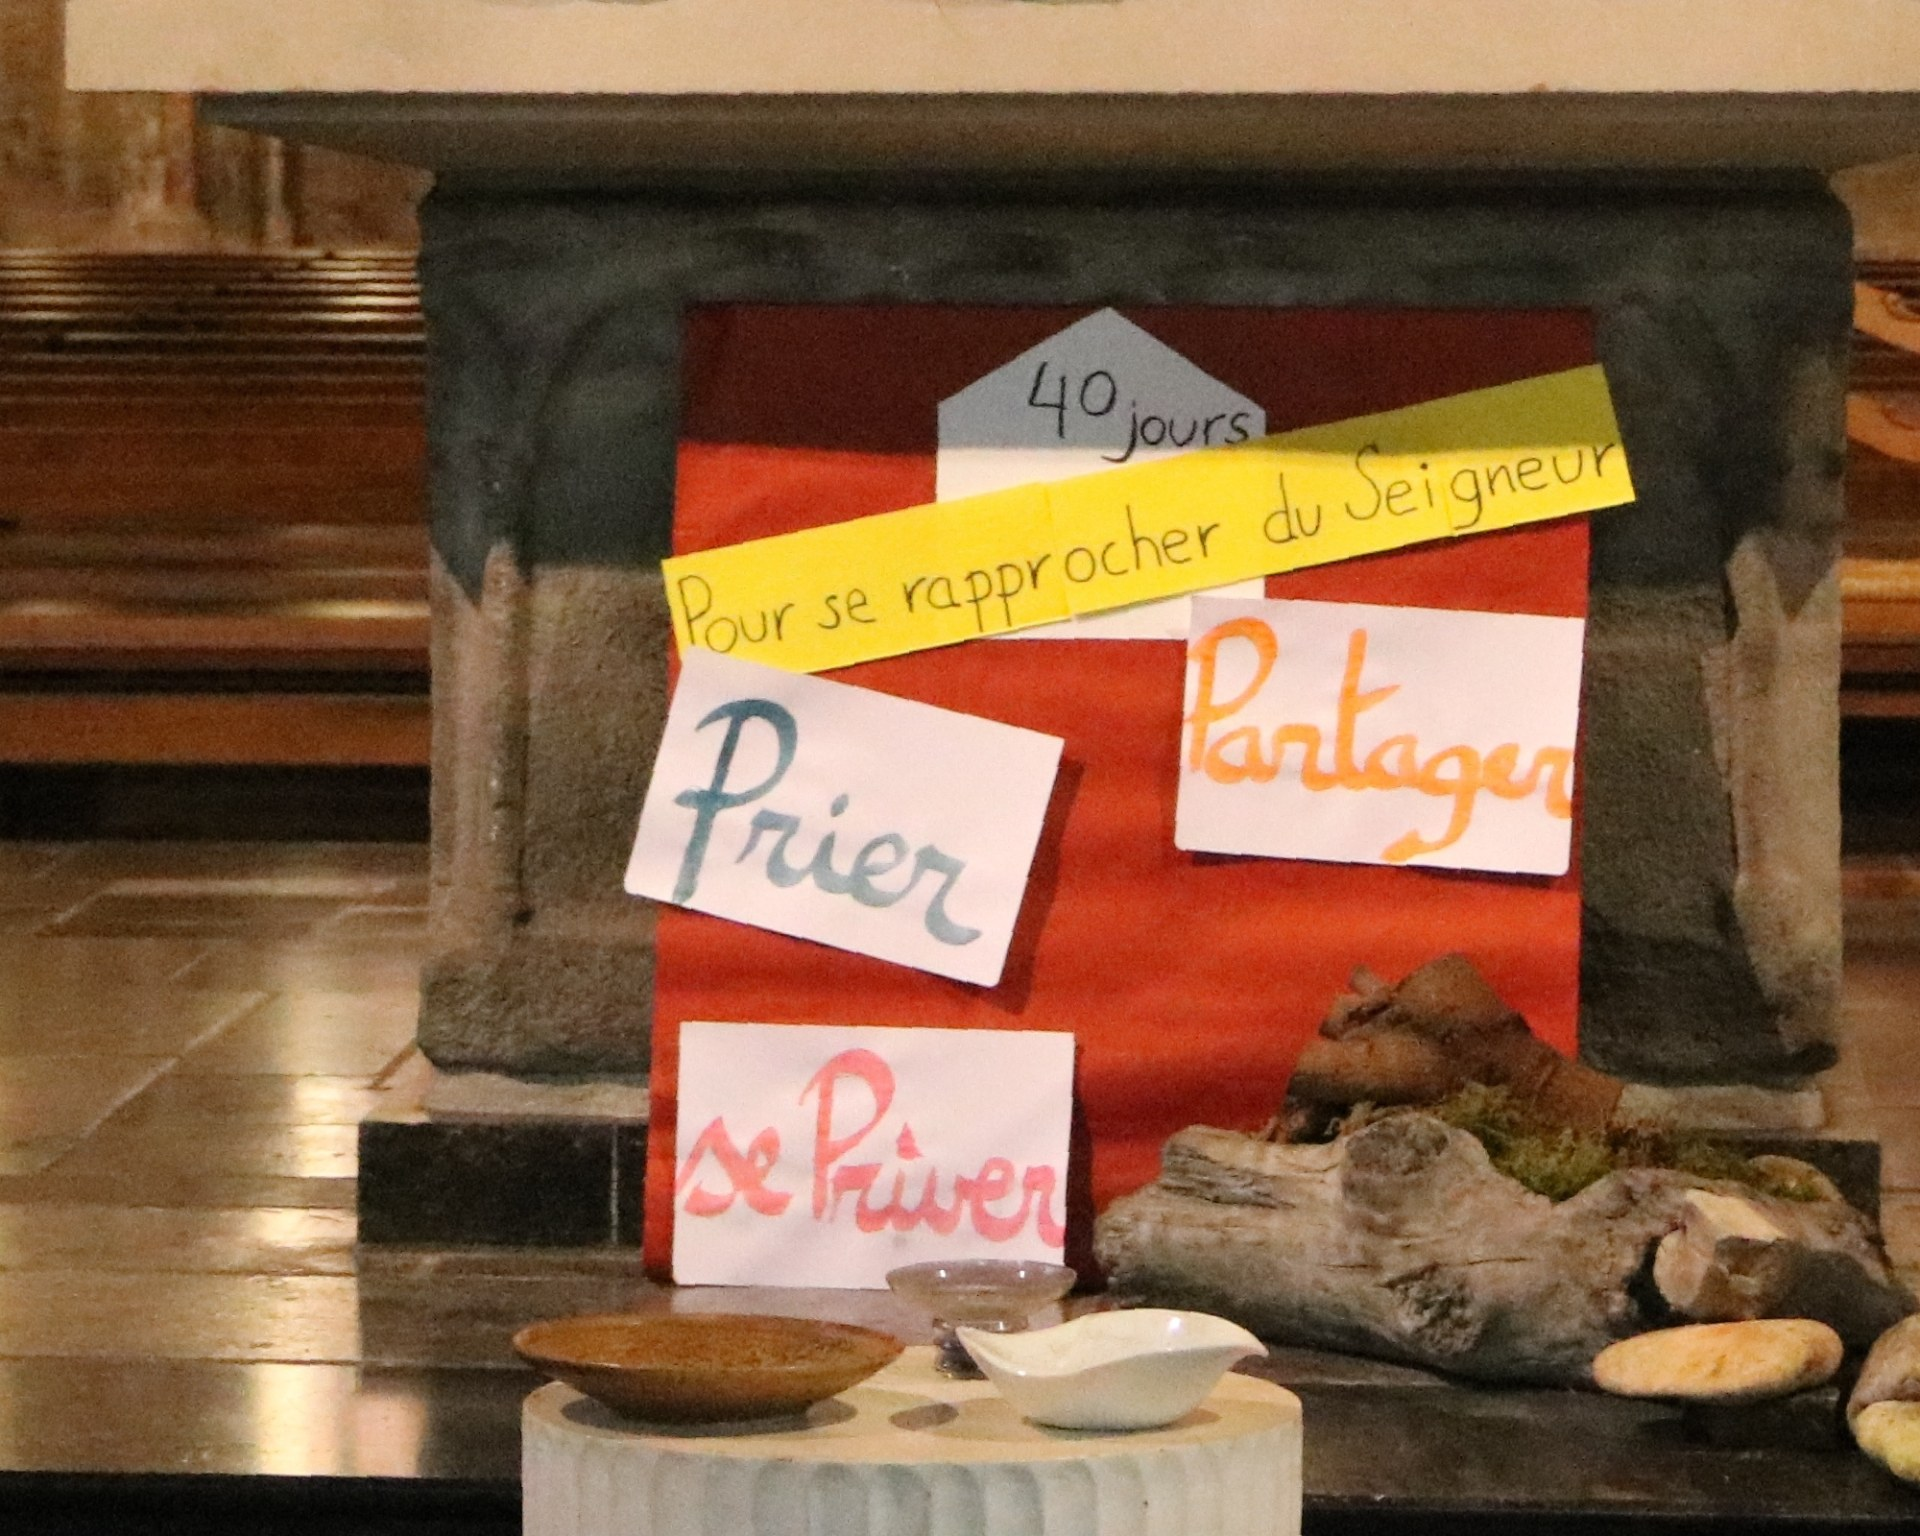 1802_Vignette_Celebration des Cendres 3